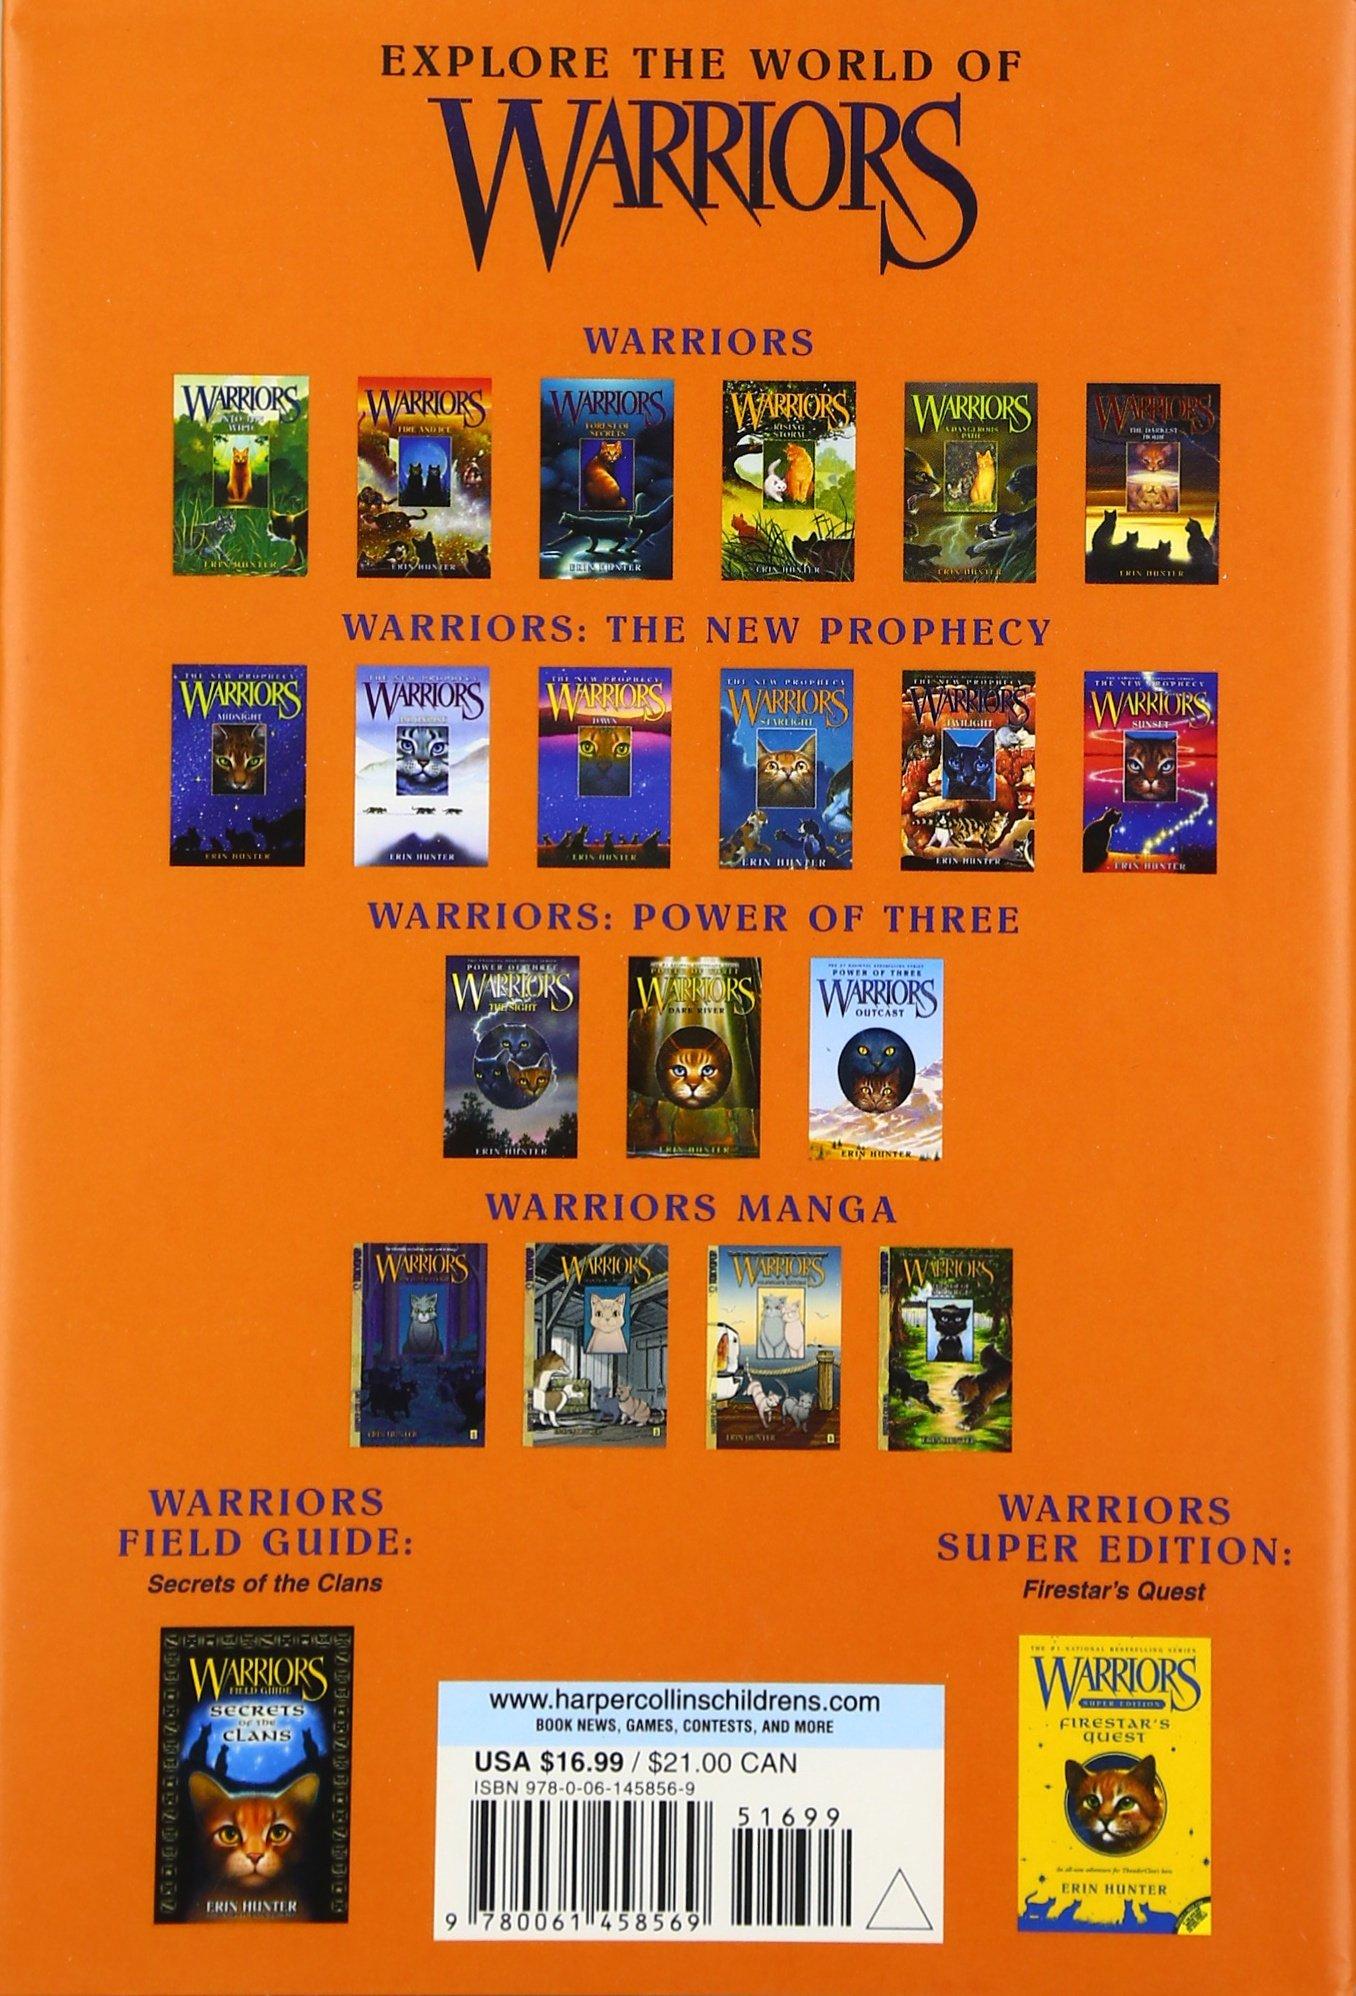 Warriors: Cats Of The Clans (warriors Field Guide): Erin Hunter, Wayne  Mcloughlin: 9780061458569: Amazon: Books